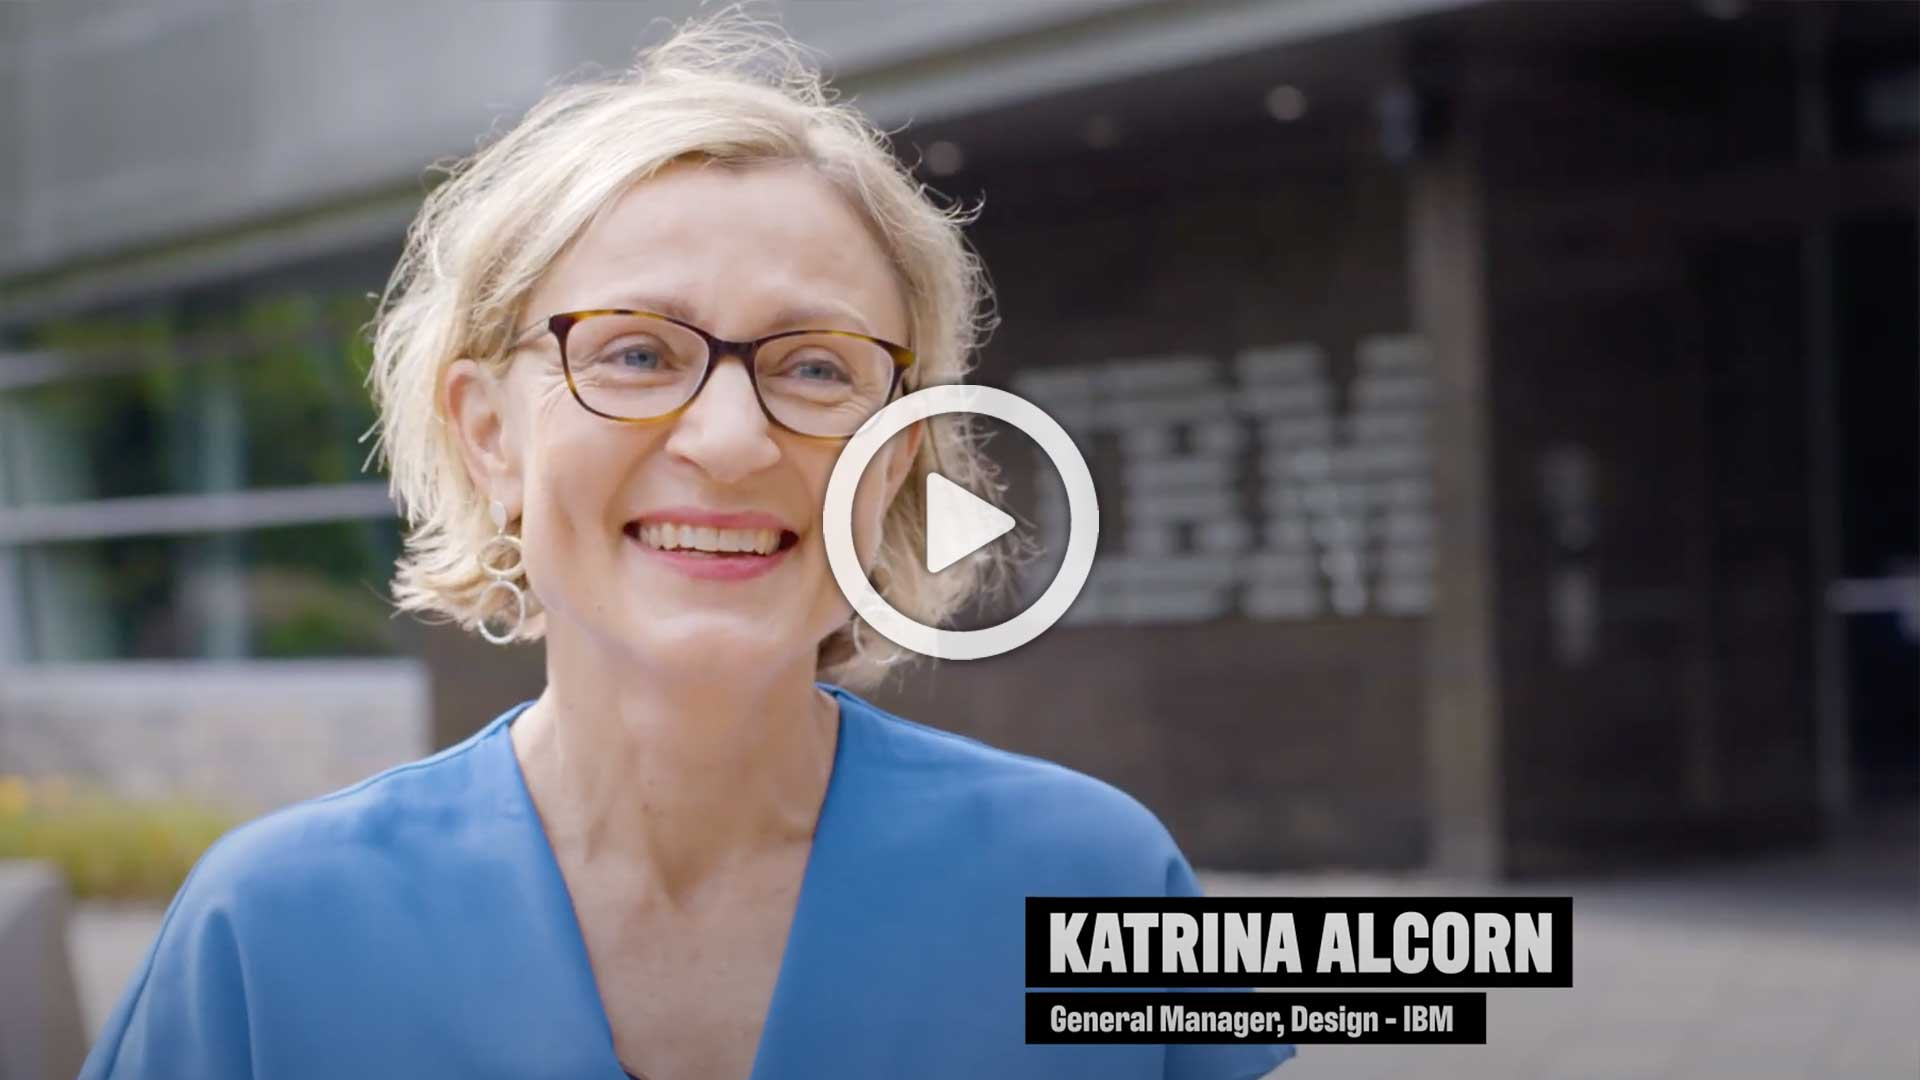 AmBD Innovations Supplemental S2 Katrina Alcorn